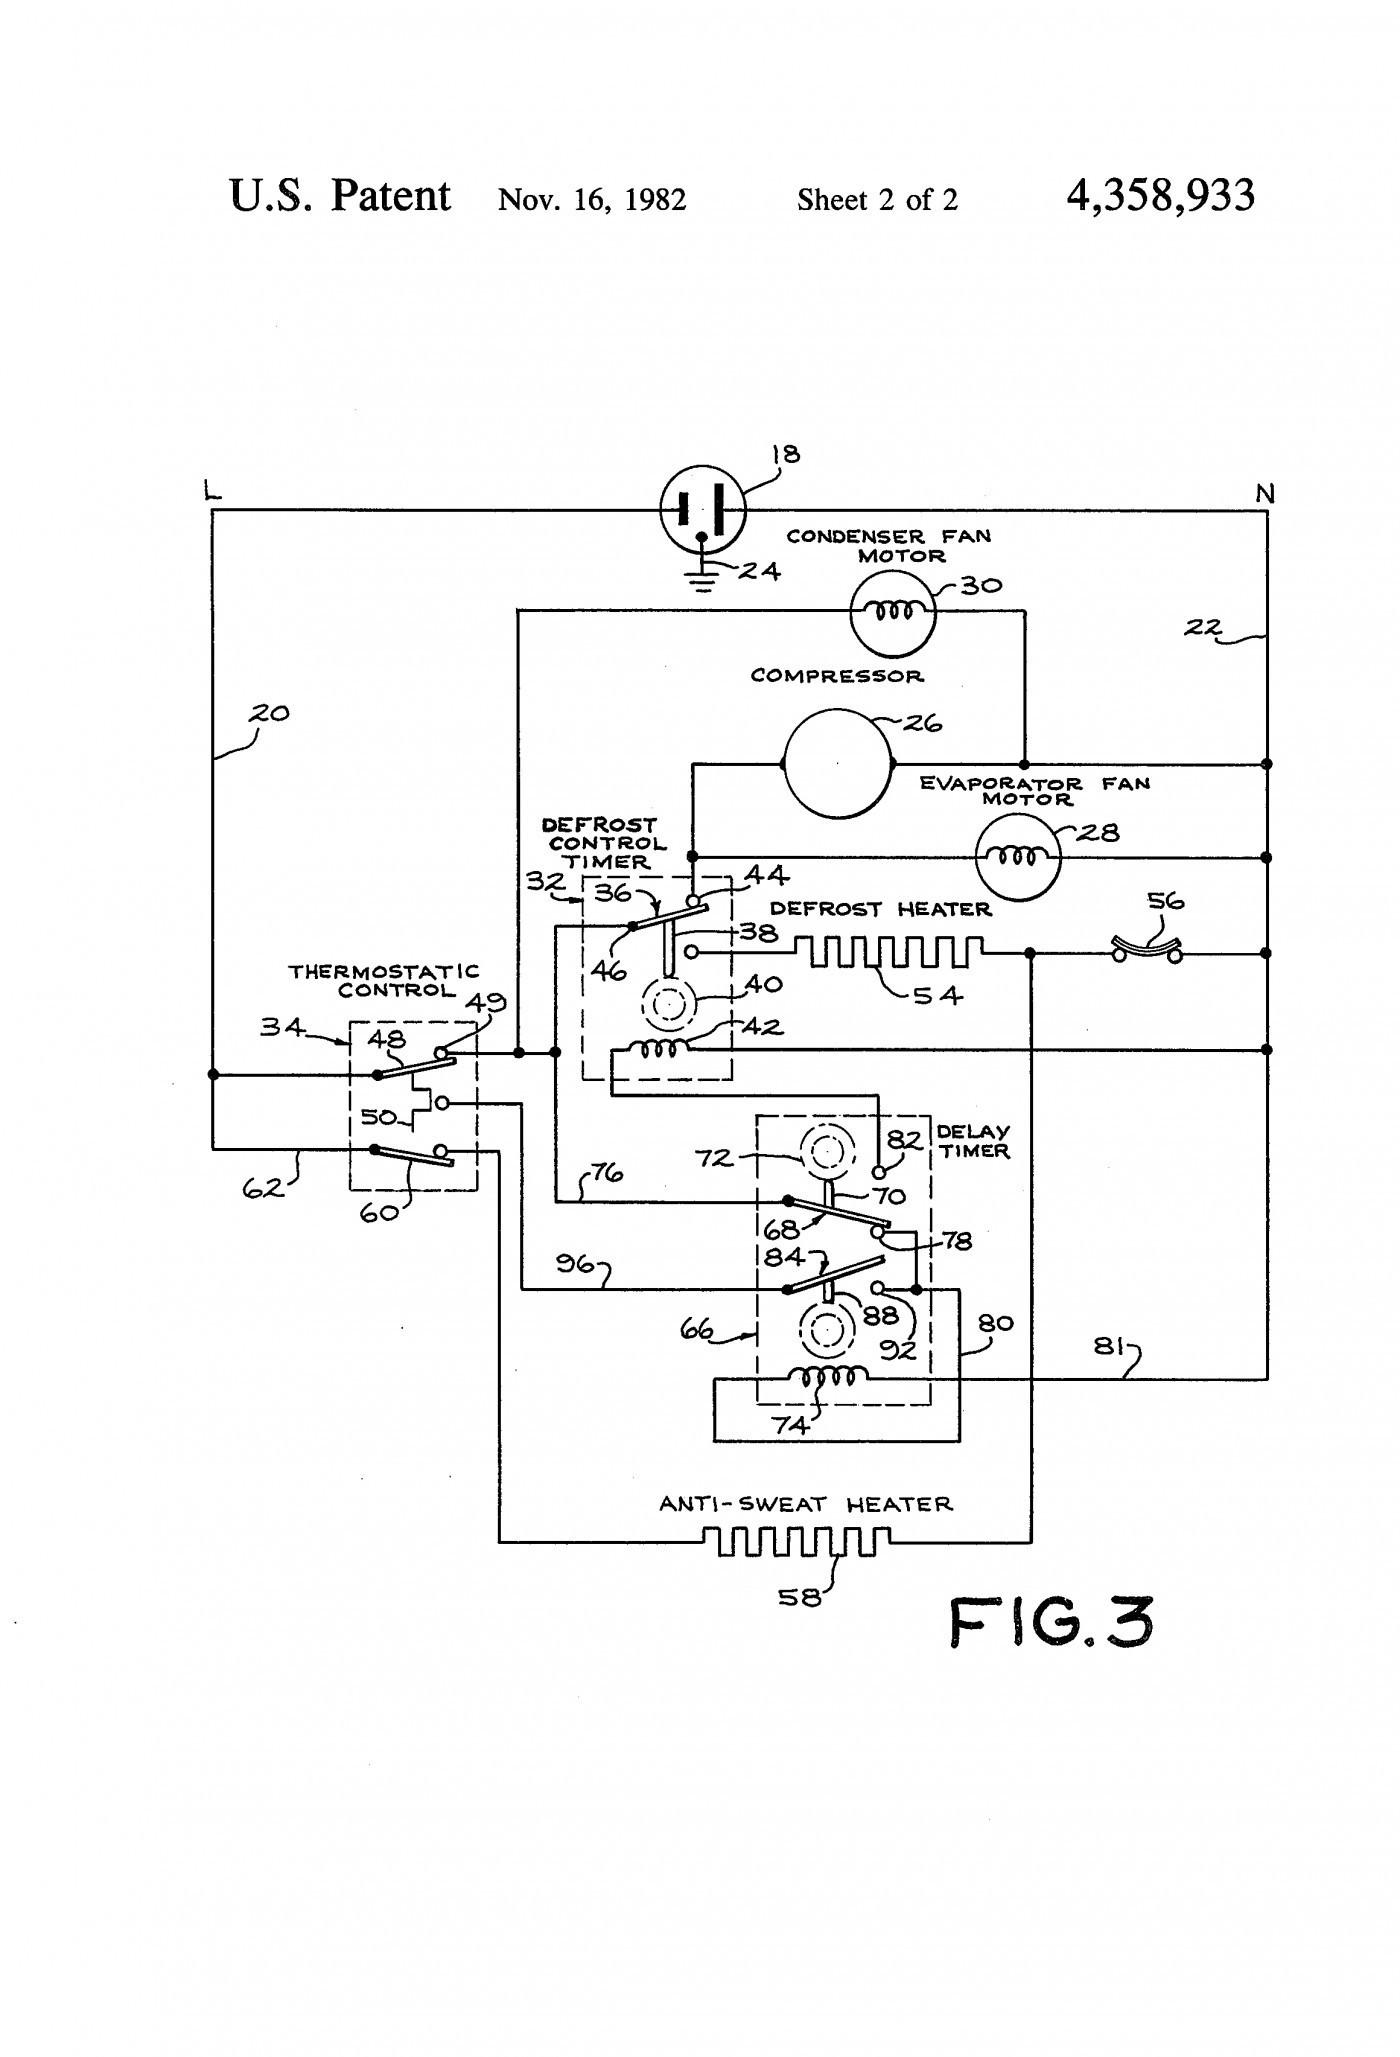 Bohn Evaporator Wiring Diagram Database